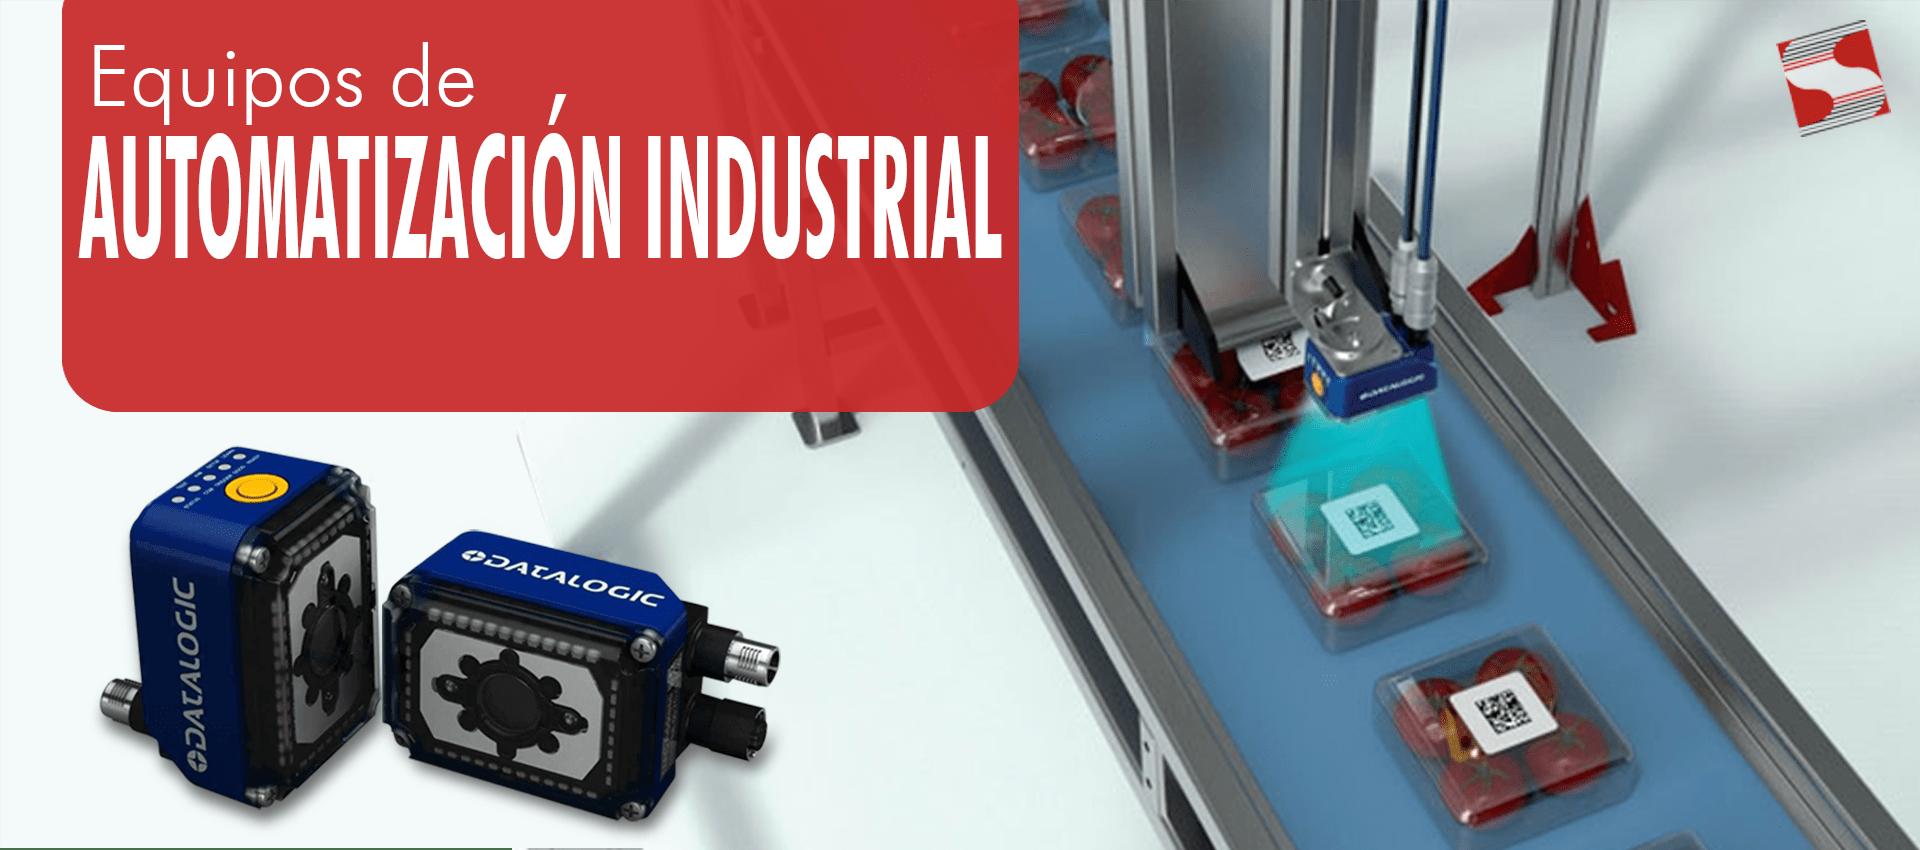 banner-automatizacion-industrial